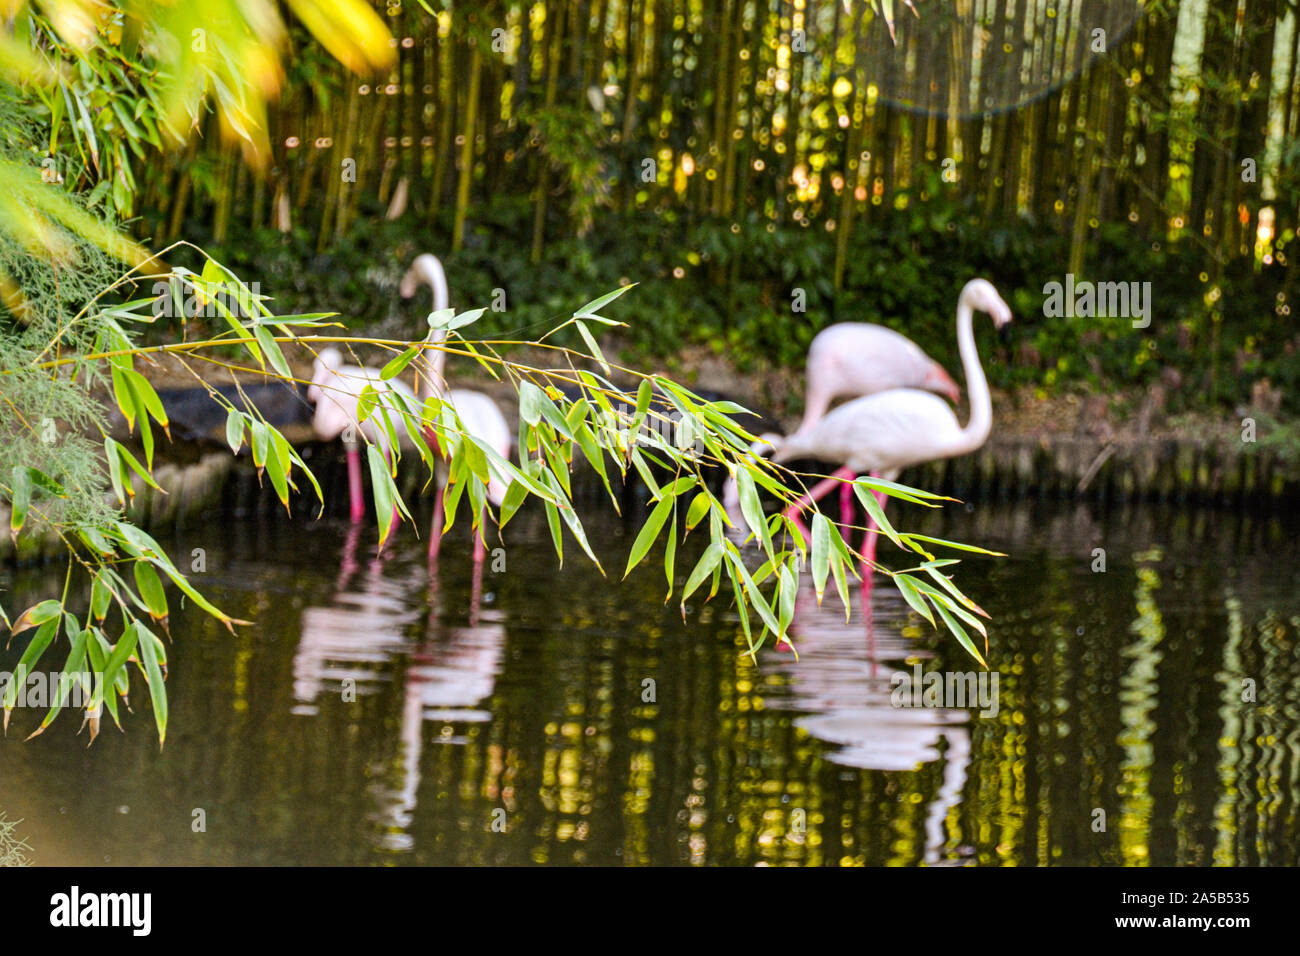 Pelikan im Zoo Punta Verde in Lignano (Italien) / Tierpark in Lignano / Sehenswürdigkeit in Lignano (Italien) Stock Photo